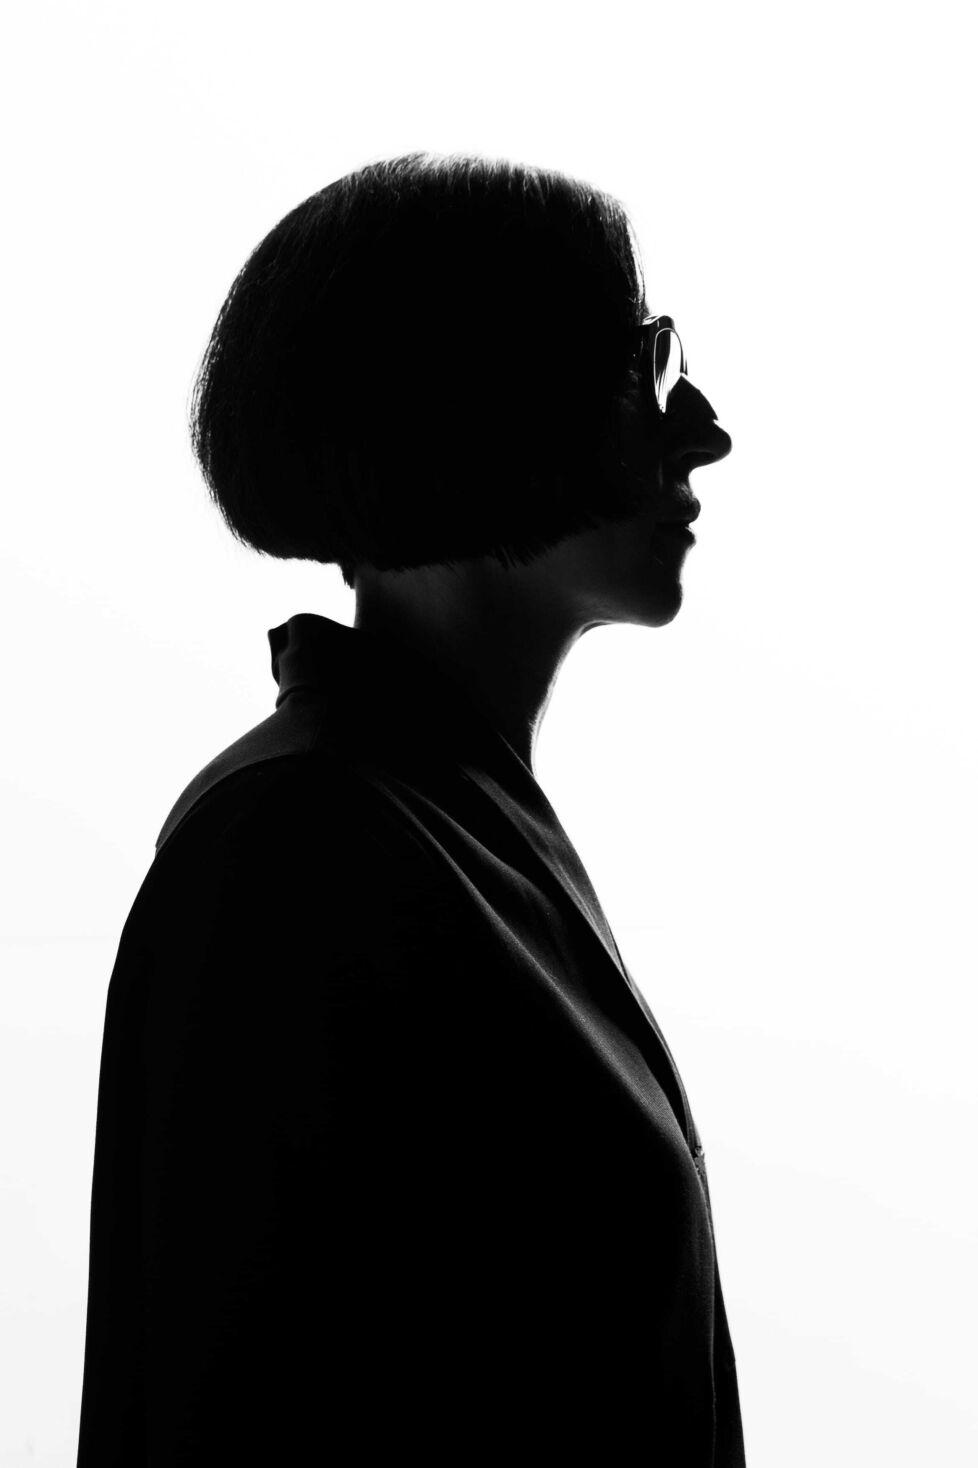 Nedda El Asmar Copyrigh Elyane Van Coillie Photography DX 0094 2